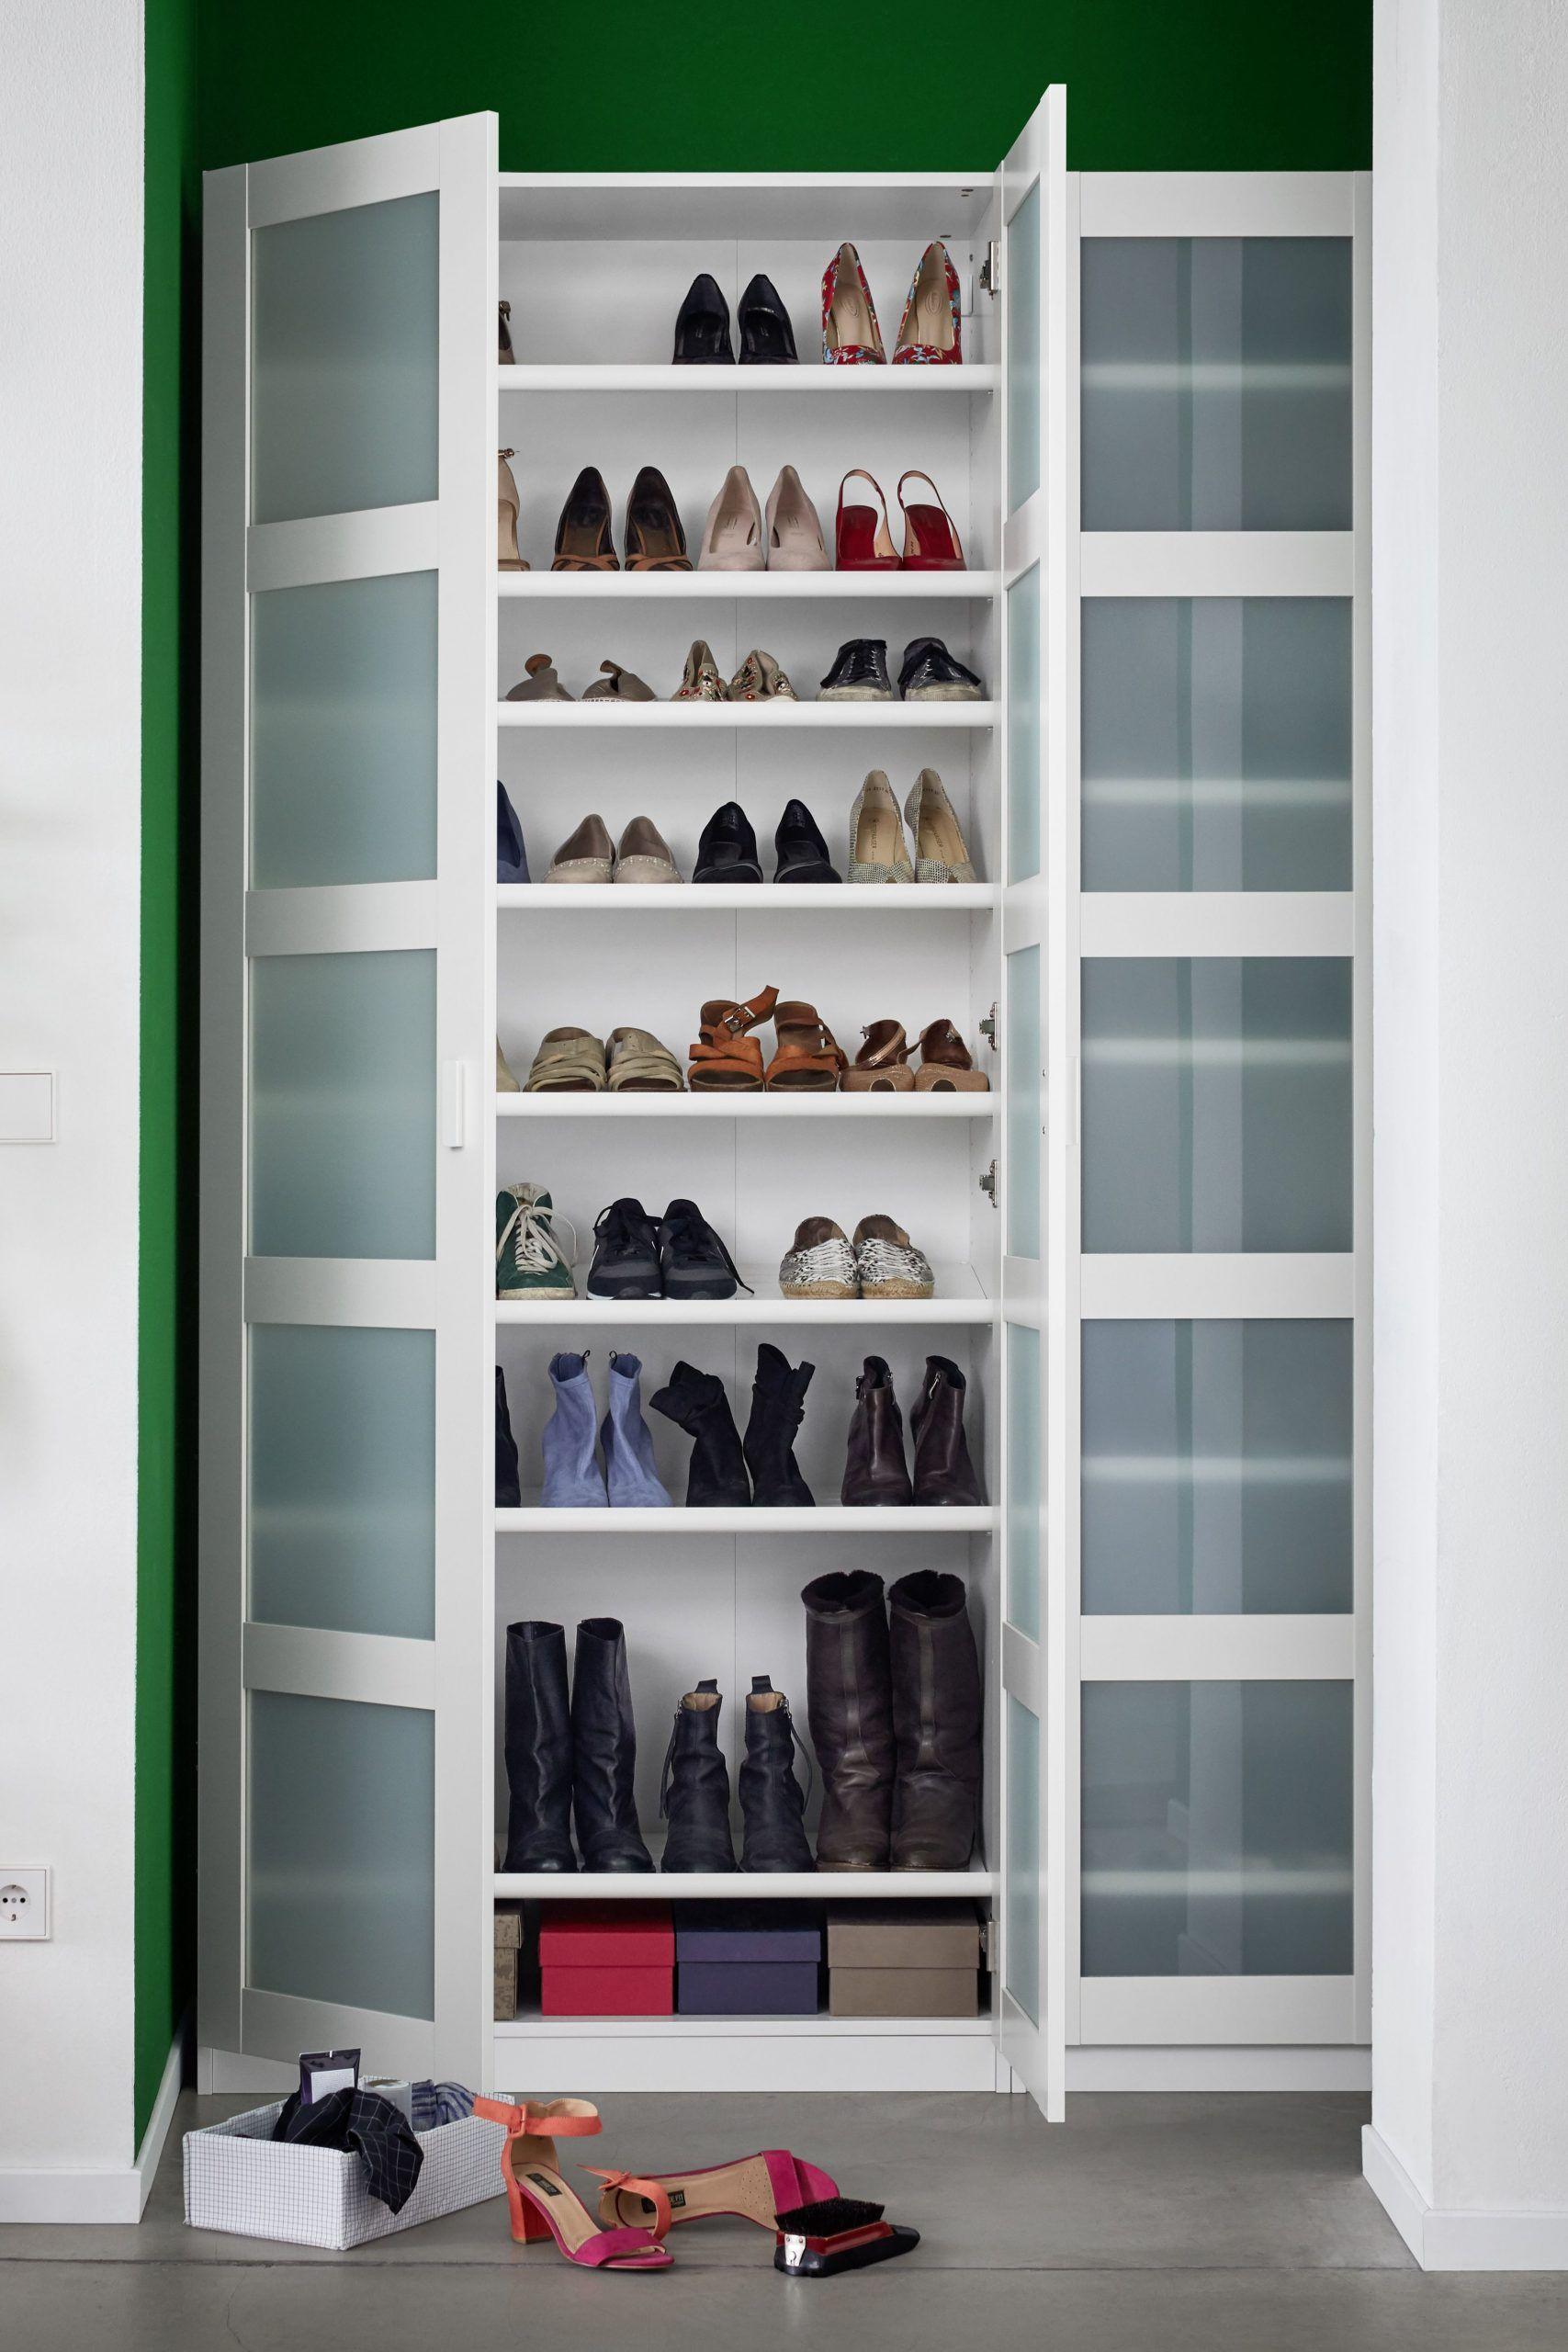 Bergsbo Tur Milchglas Weiss Ikea Deutschland In 2020 Shoe Organization Closet Shoe Organizer Ikea Shoe